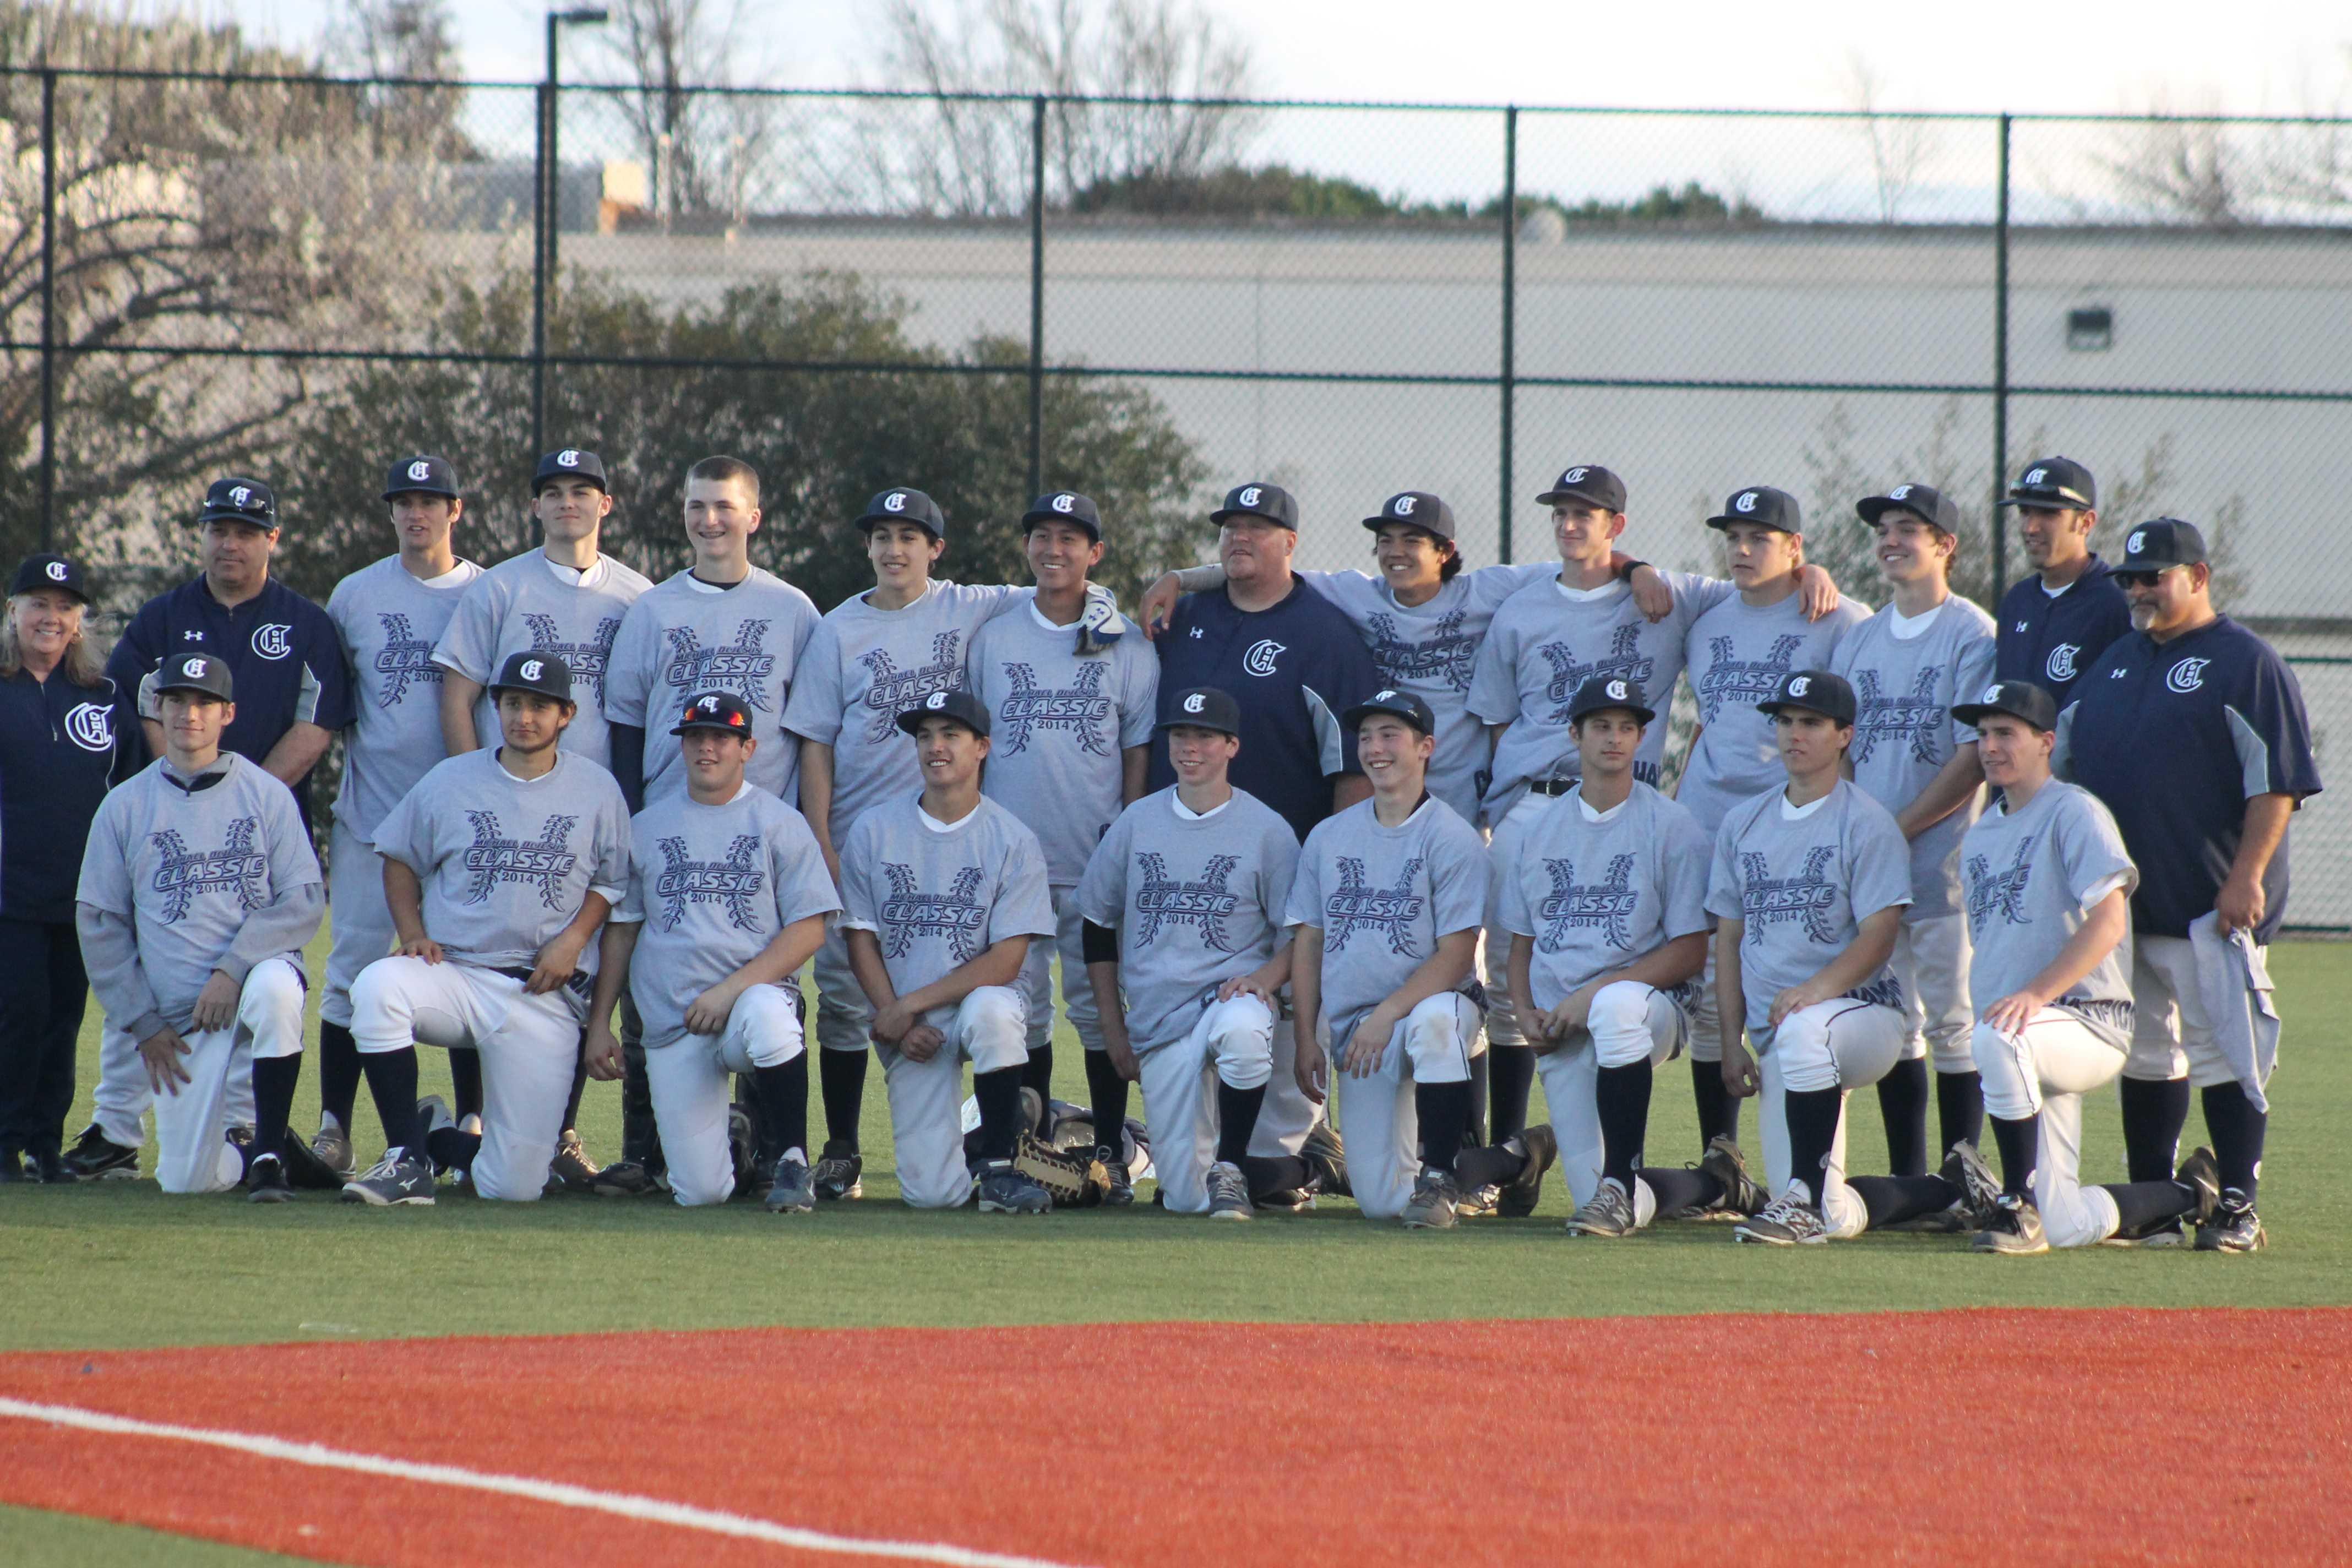 Varsity baseball poses after winning championship game.